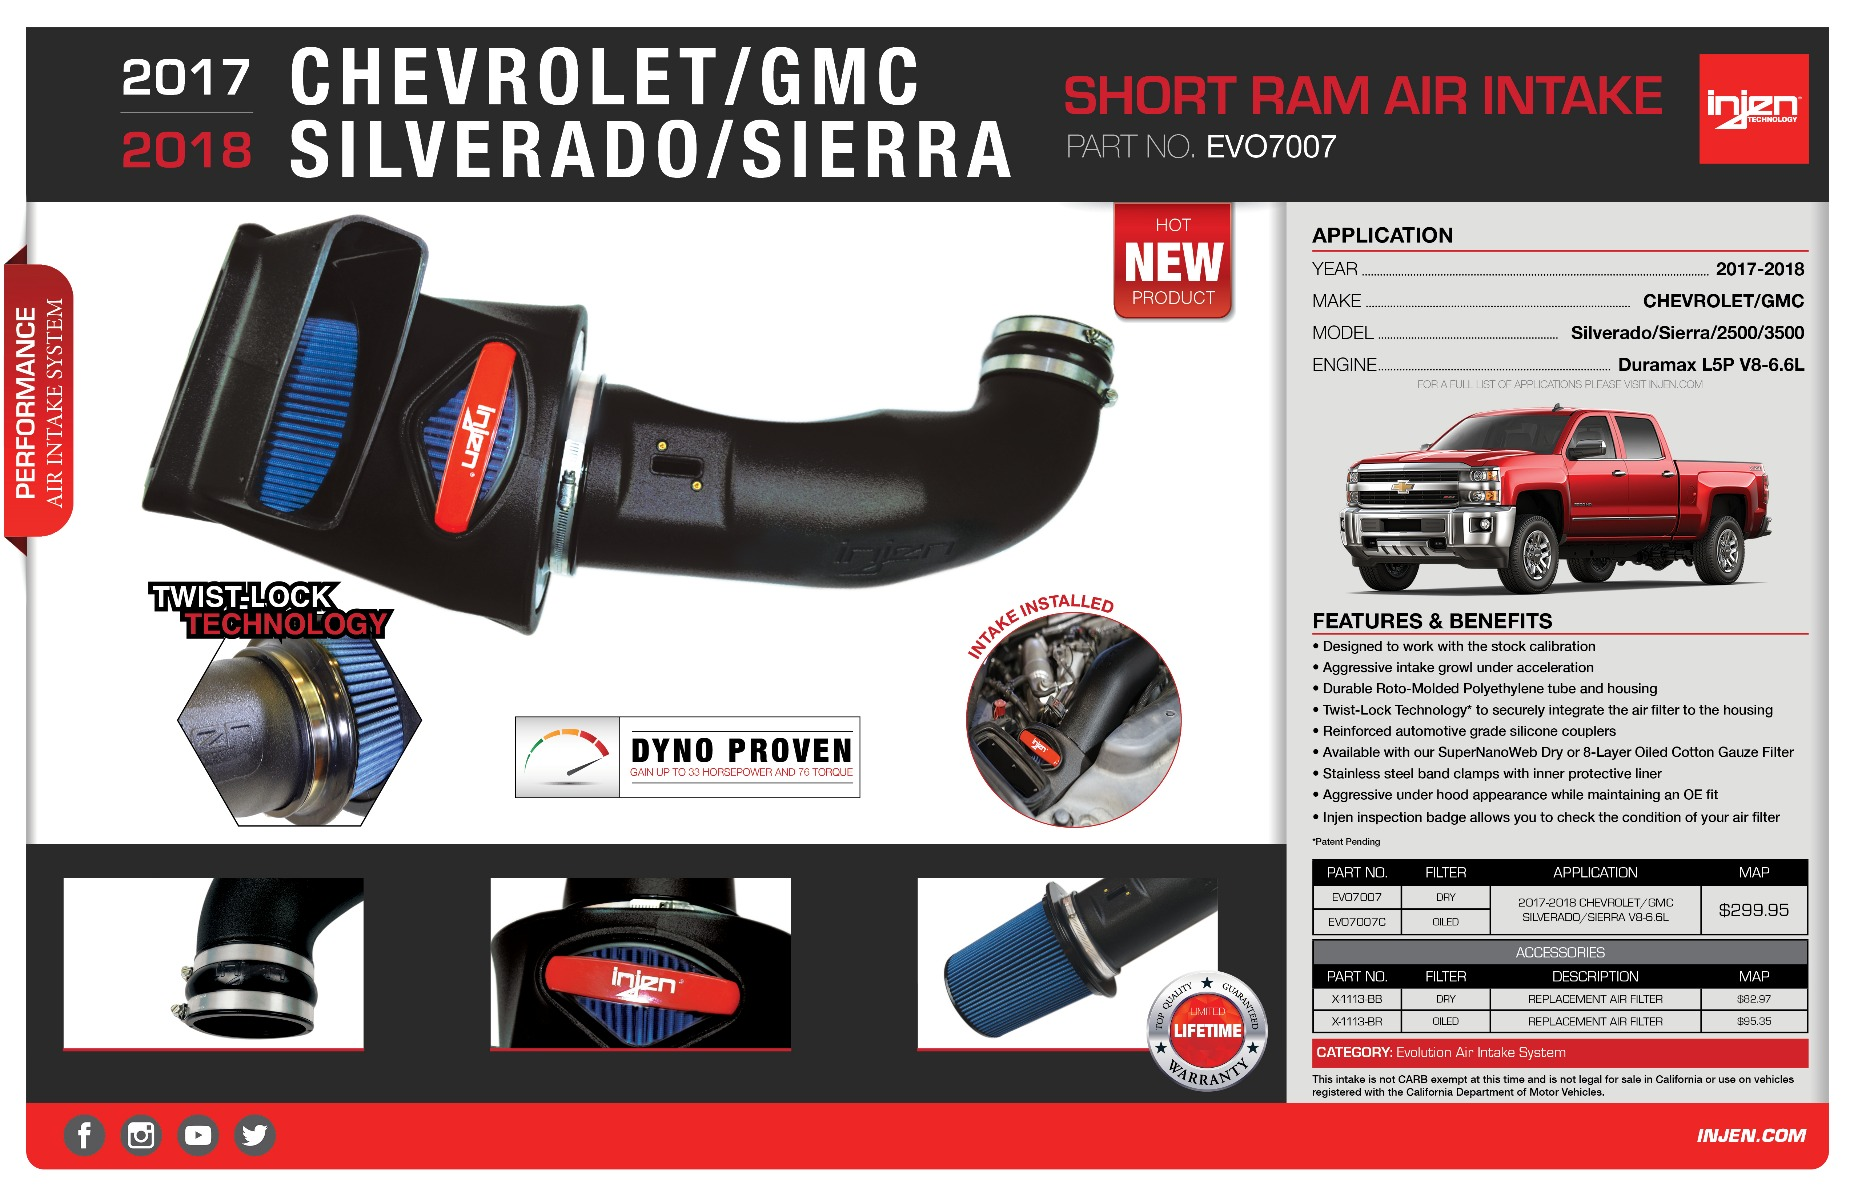 Injen Evo7007 Cold Air Intake System For The 2017 2018 Chevy Gmc Silverado Sierra 2500 3500 6 6l Turbo Diesel L5p V8